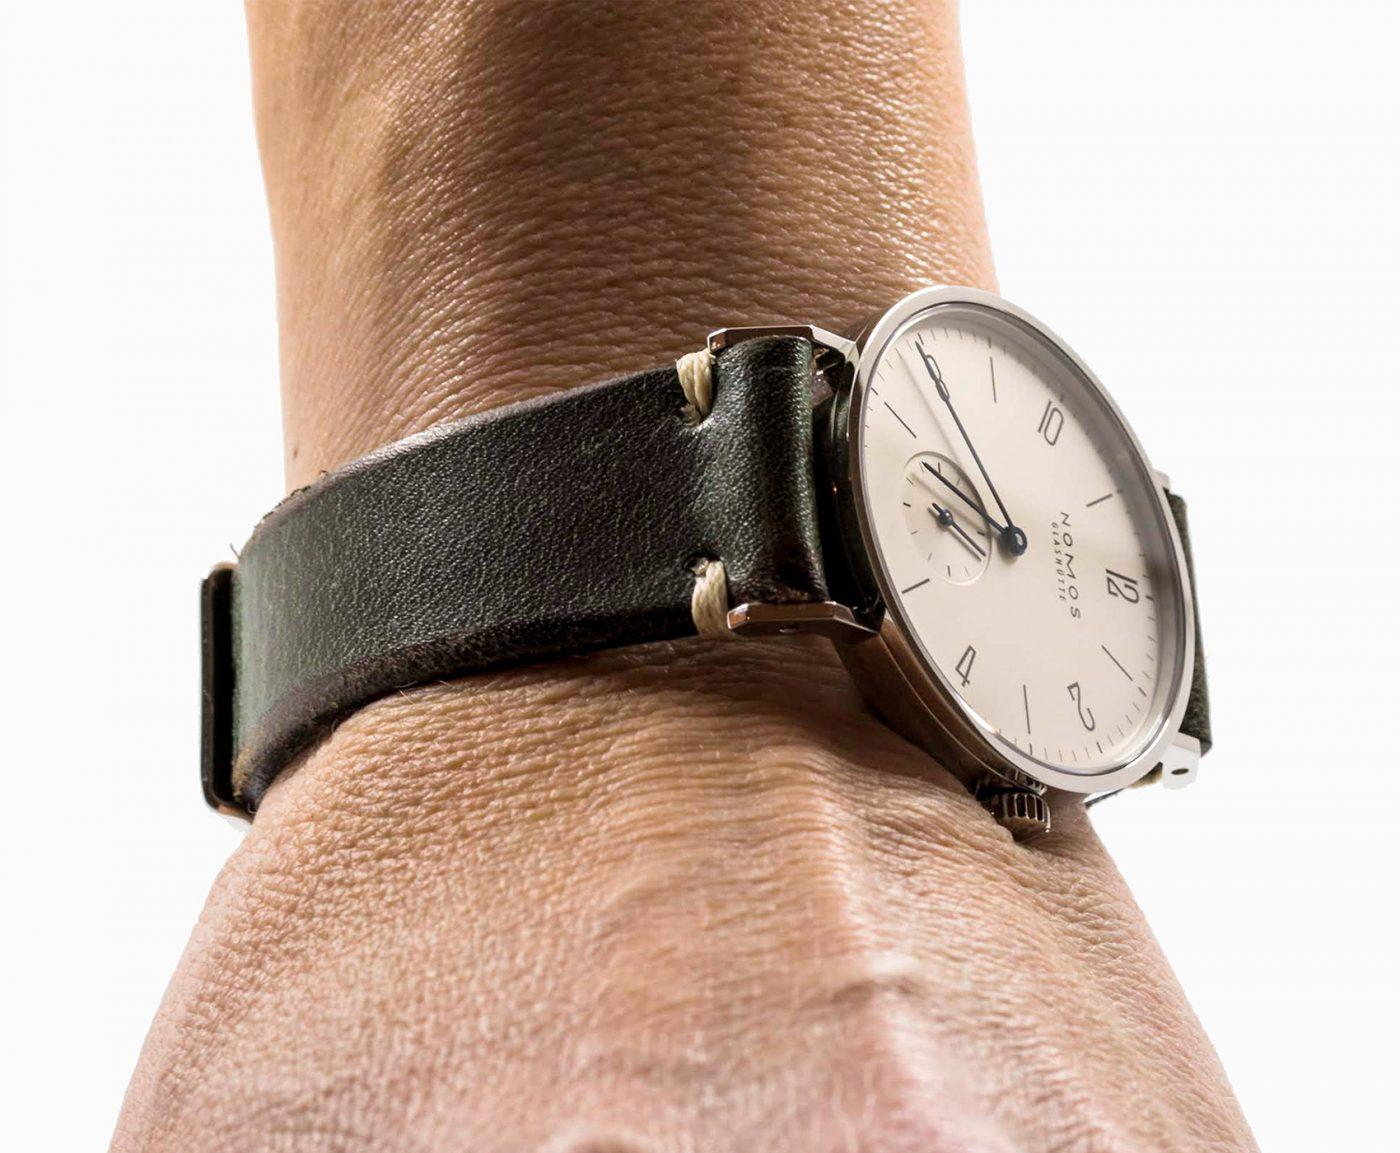 Nomos_tangente_vintage_leather_military_green_watchbandit_original